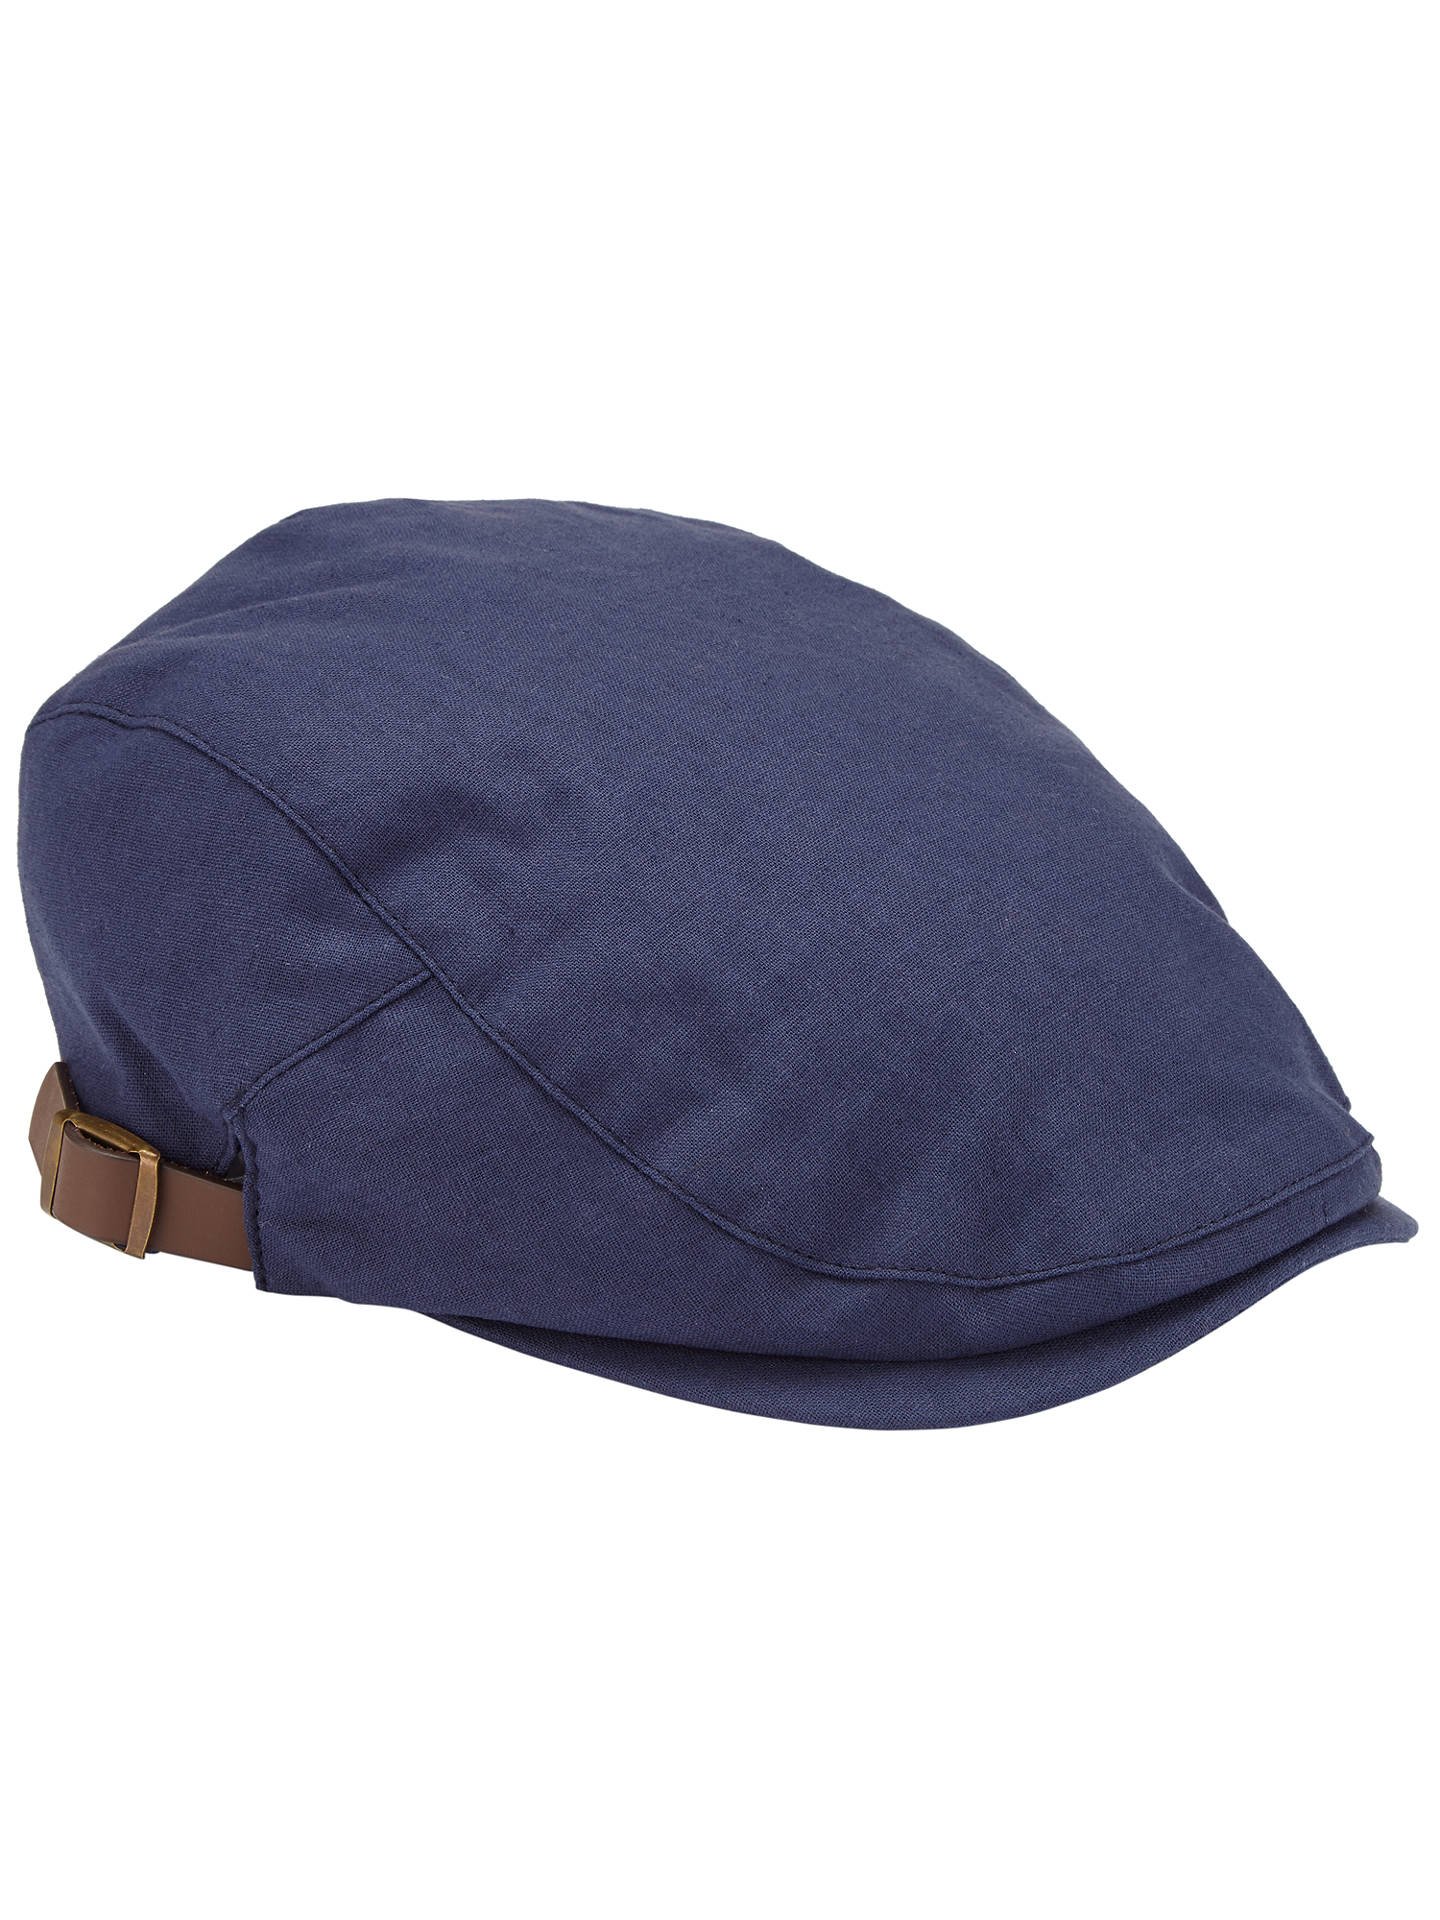 674b4f71a44 BuyJohn Lewis Linen Flat Cap